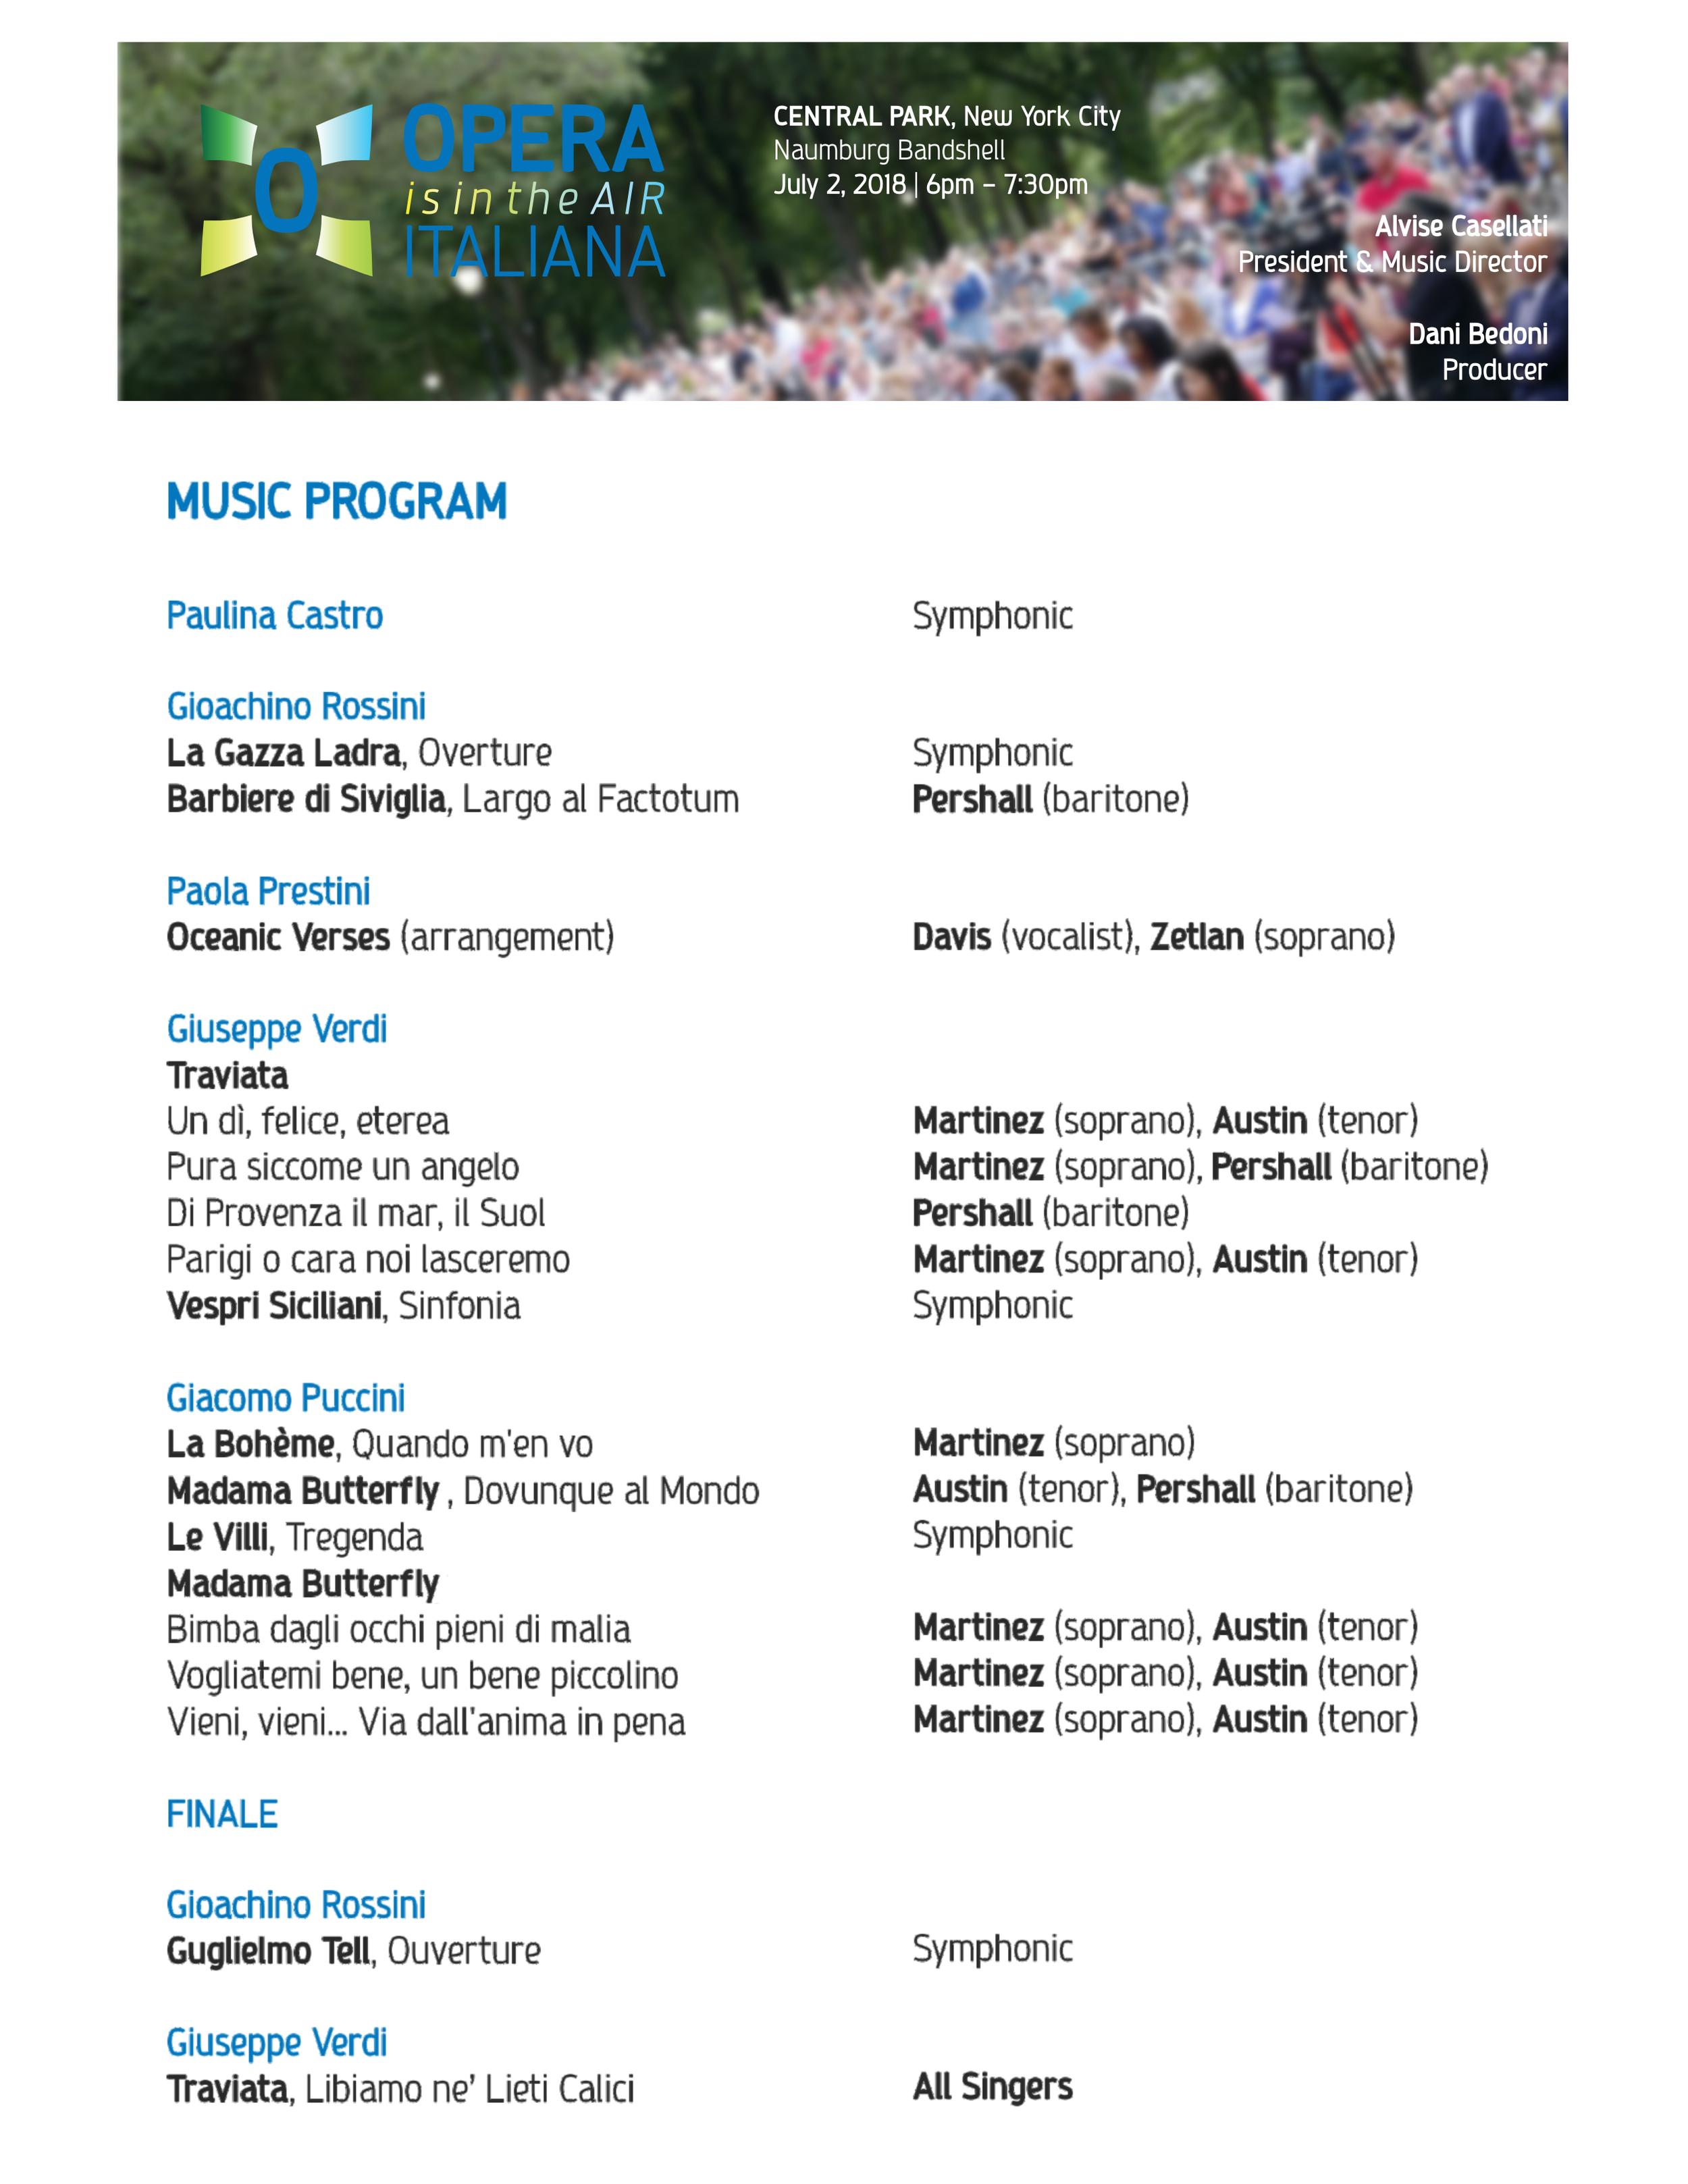 opera italiana is in the air - music program